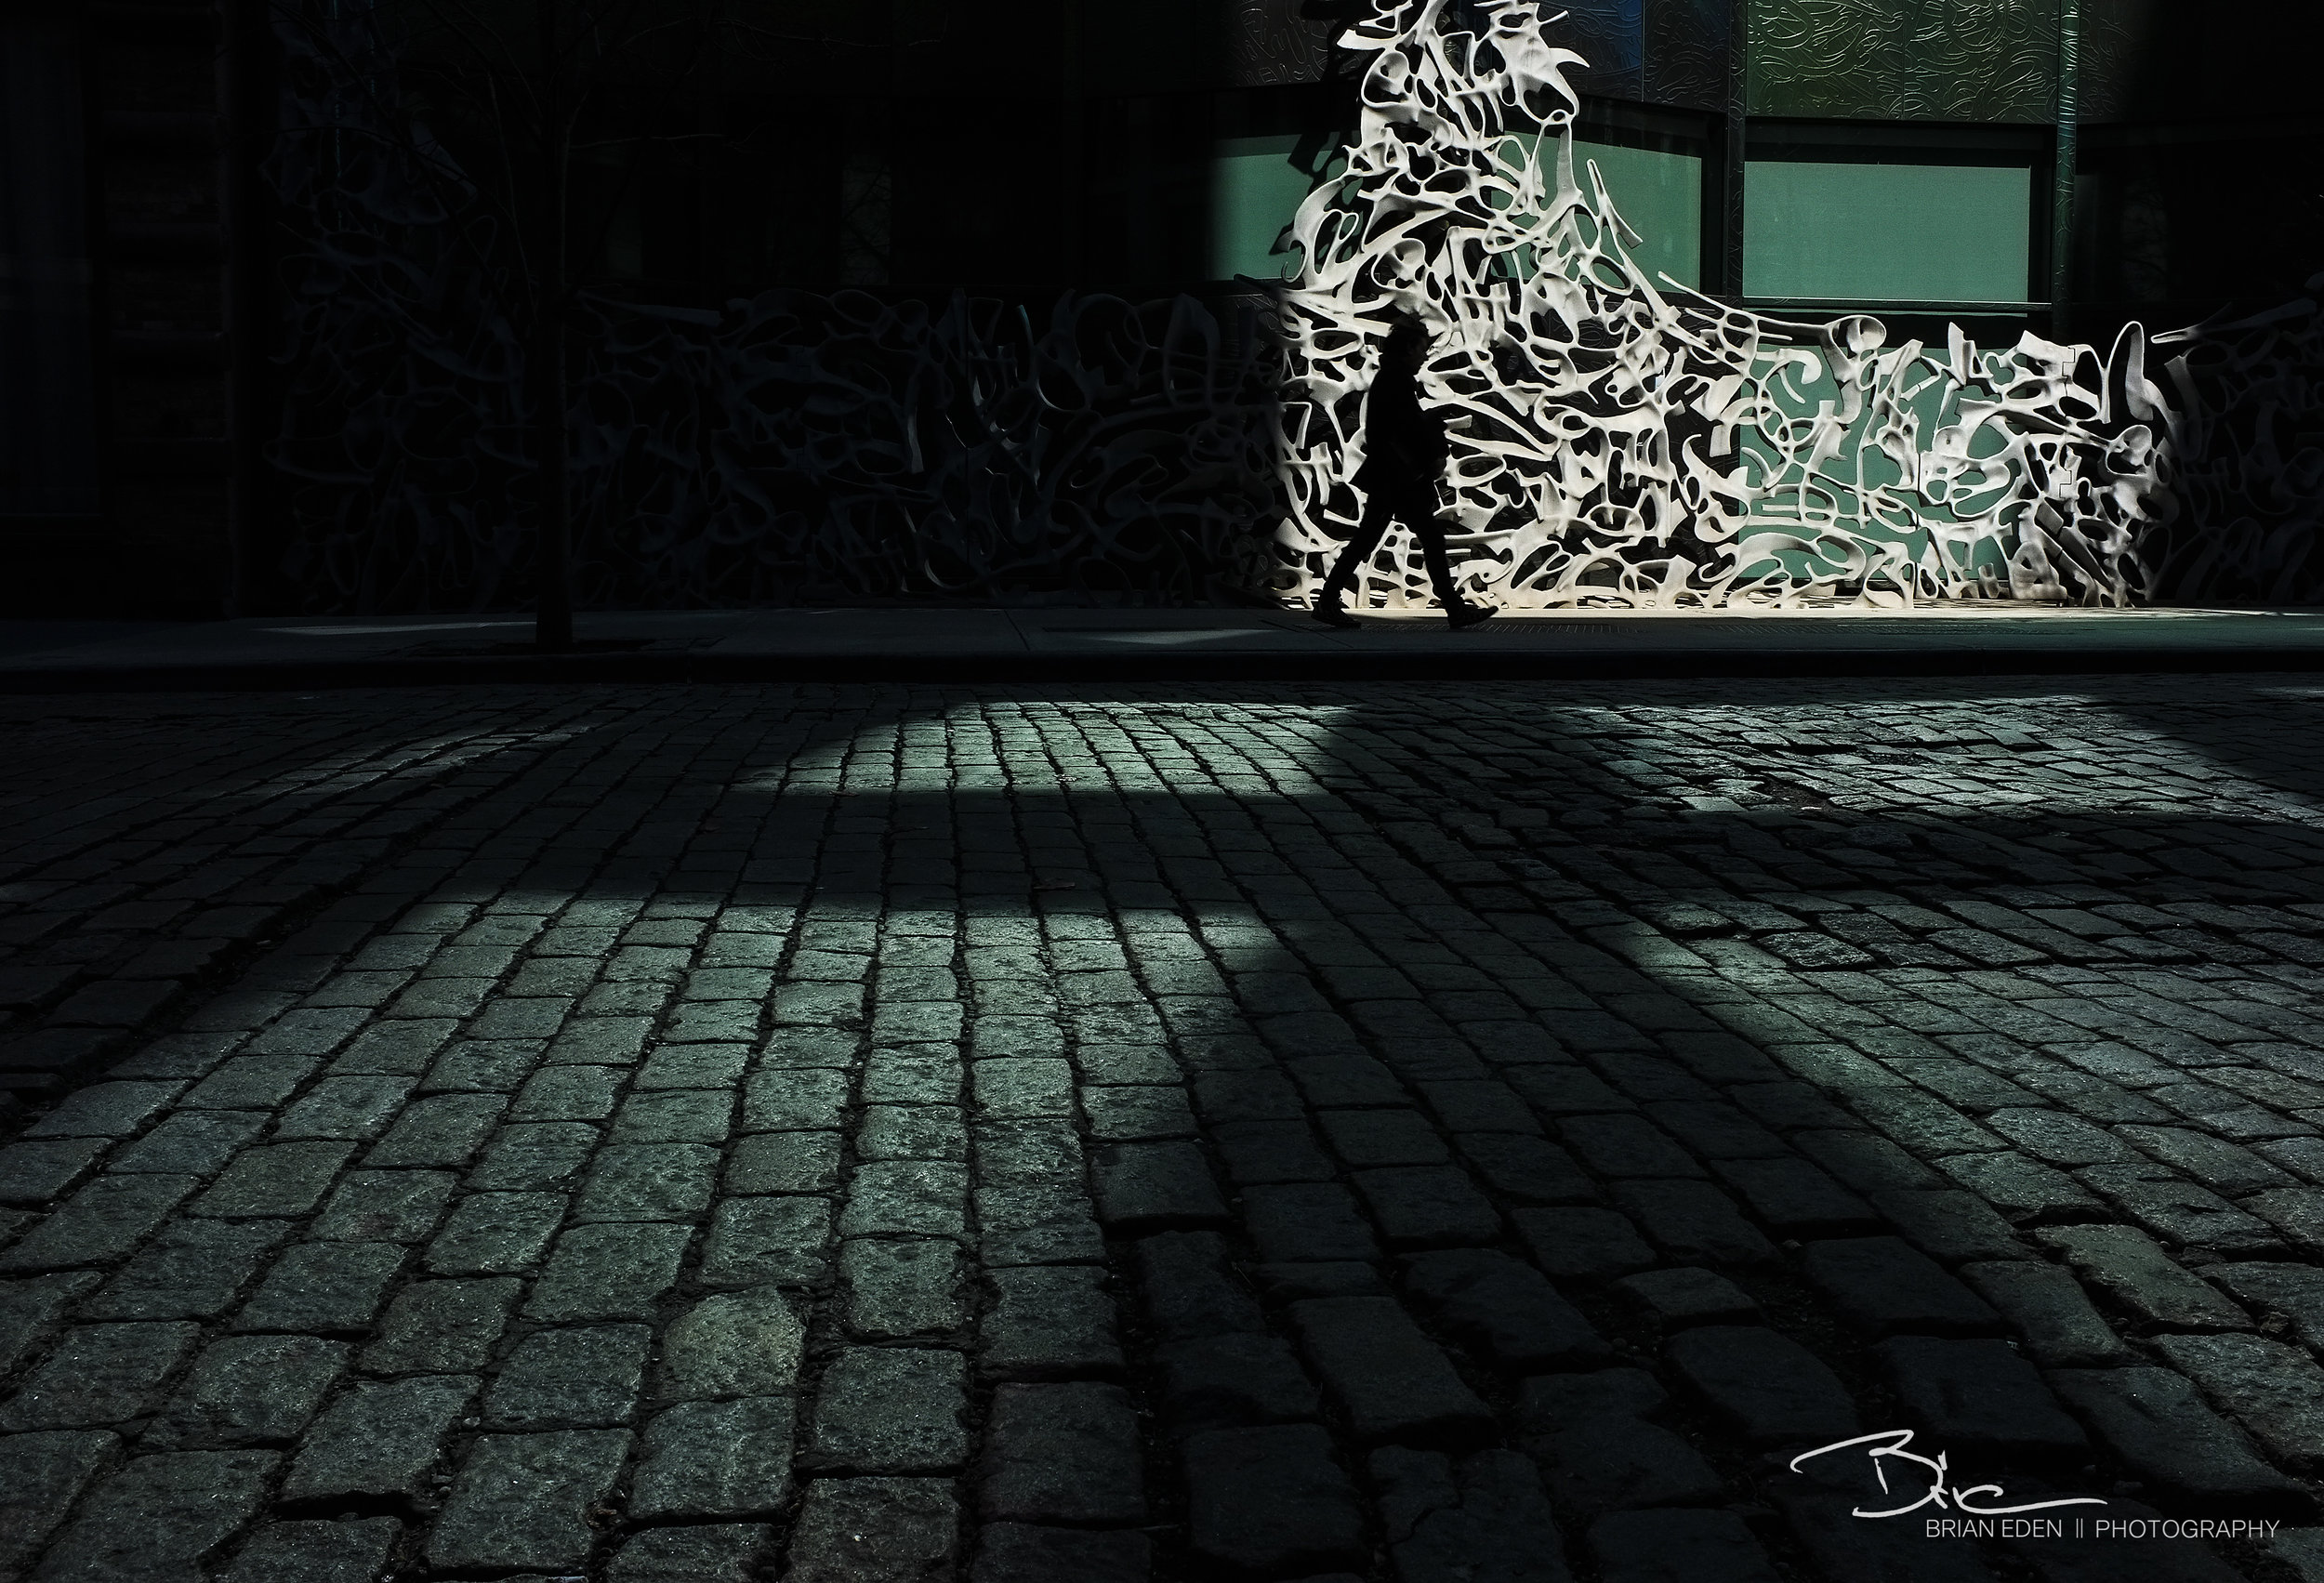 Bond Street Silhouette